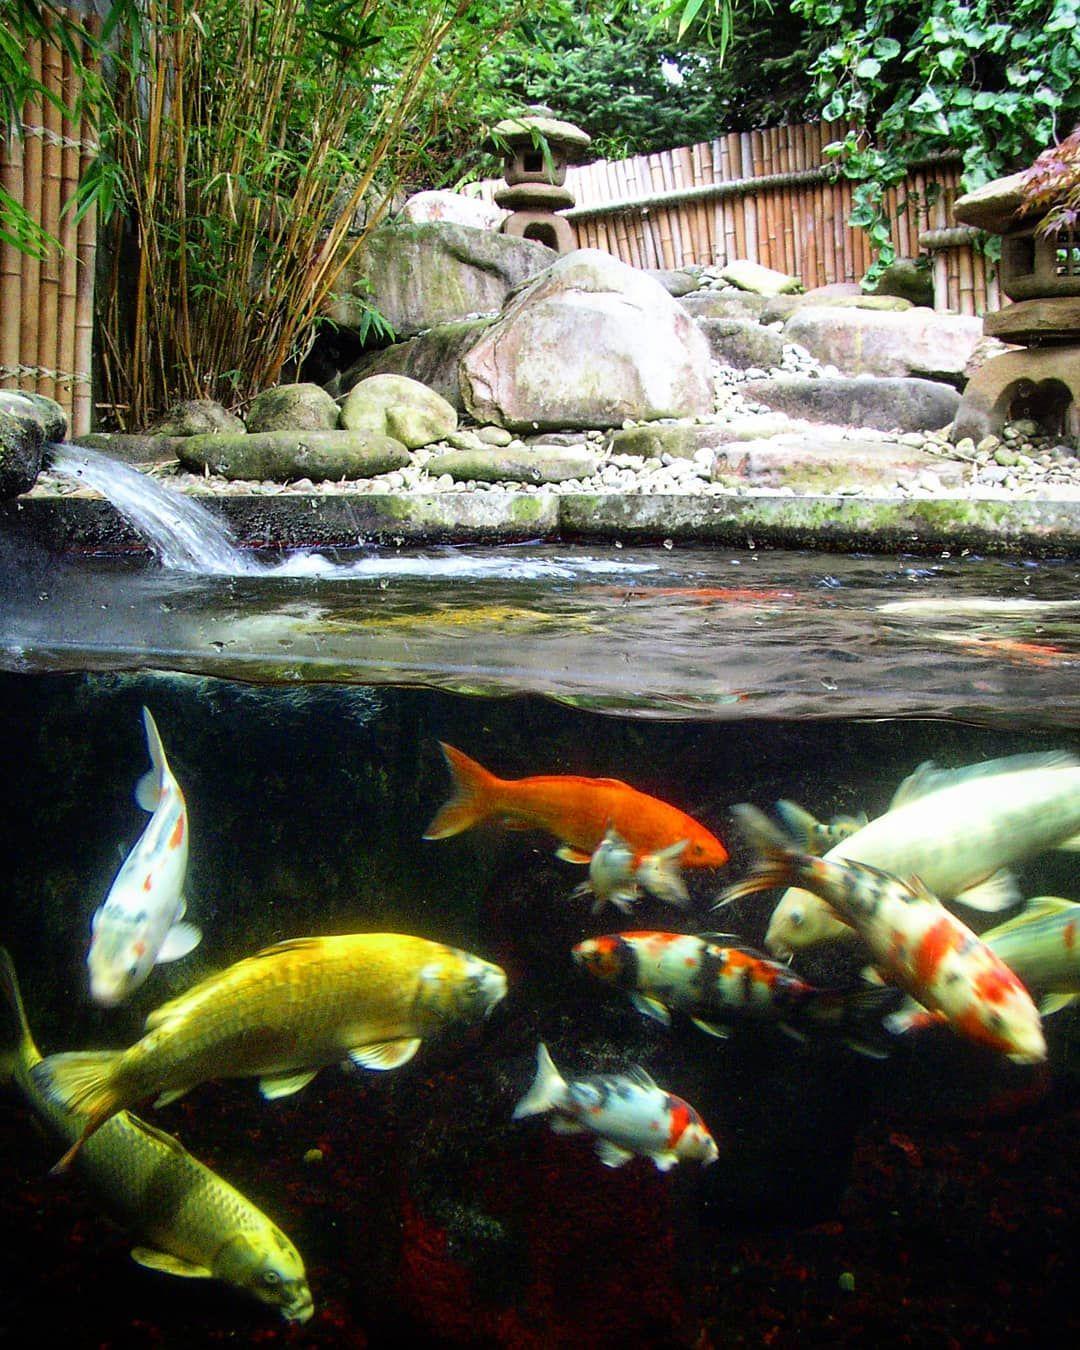 9169abfa3341544e3550a3d11402a6b0 - The Koi Whisperer Sanctuary & Japanese Gardens